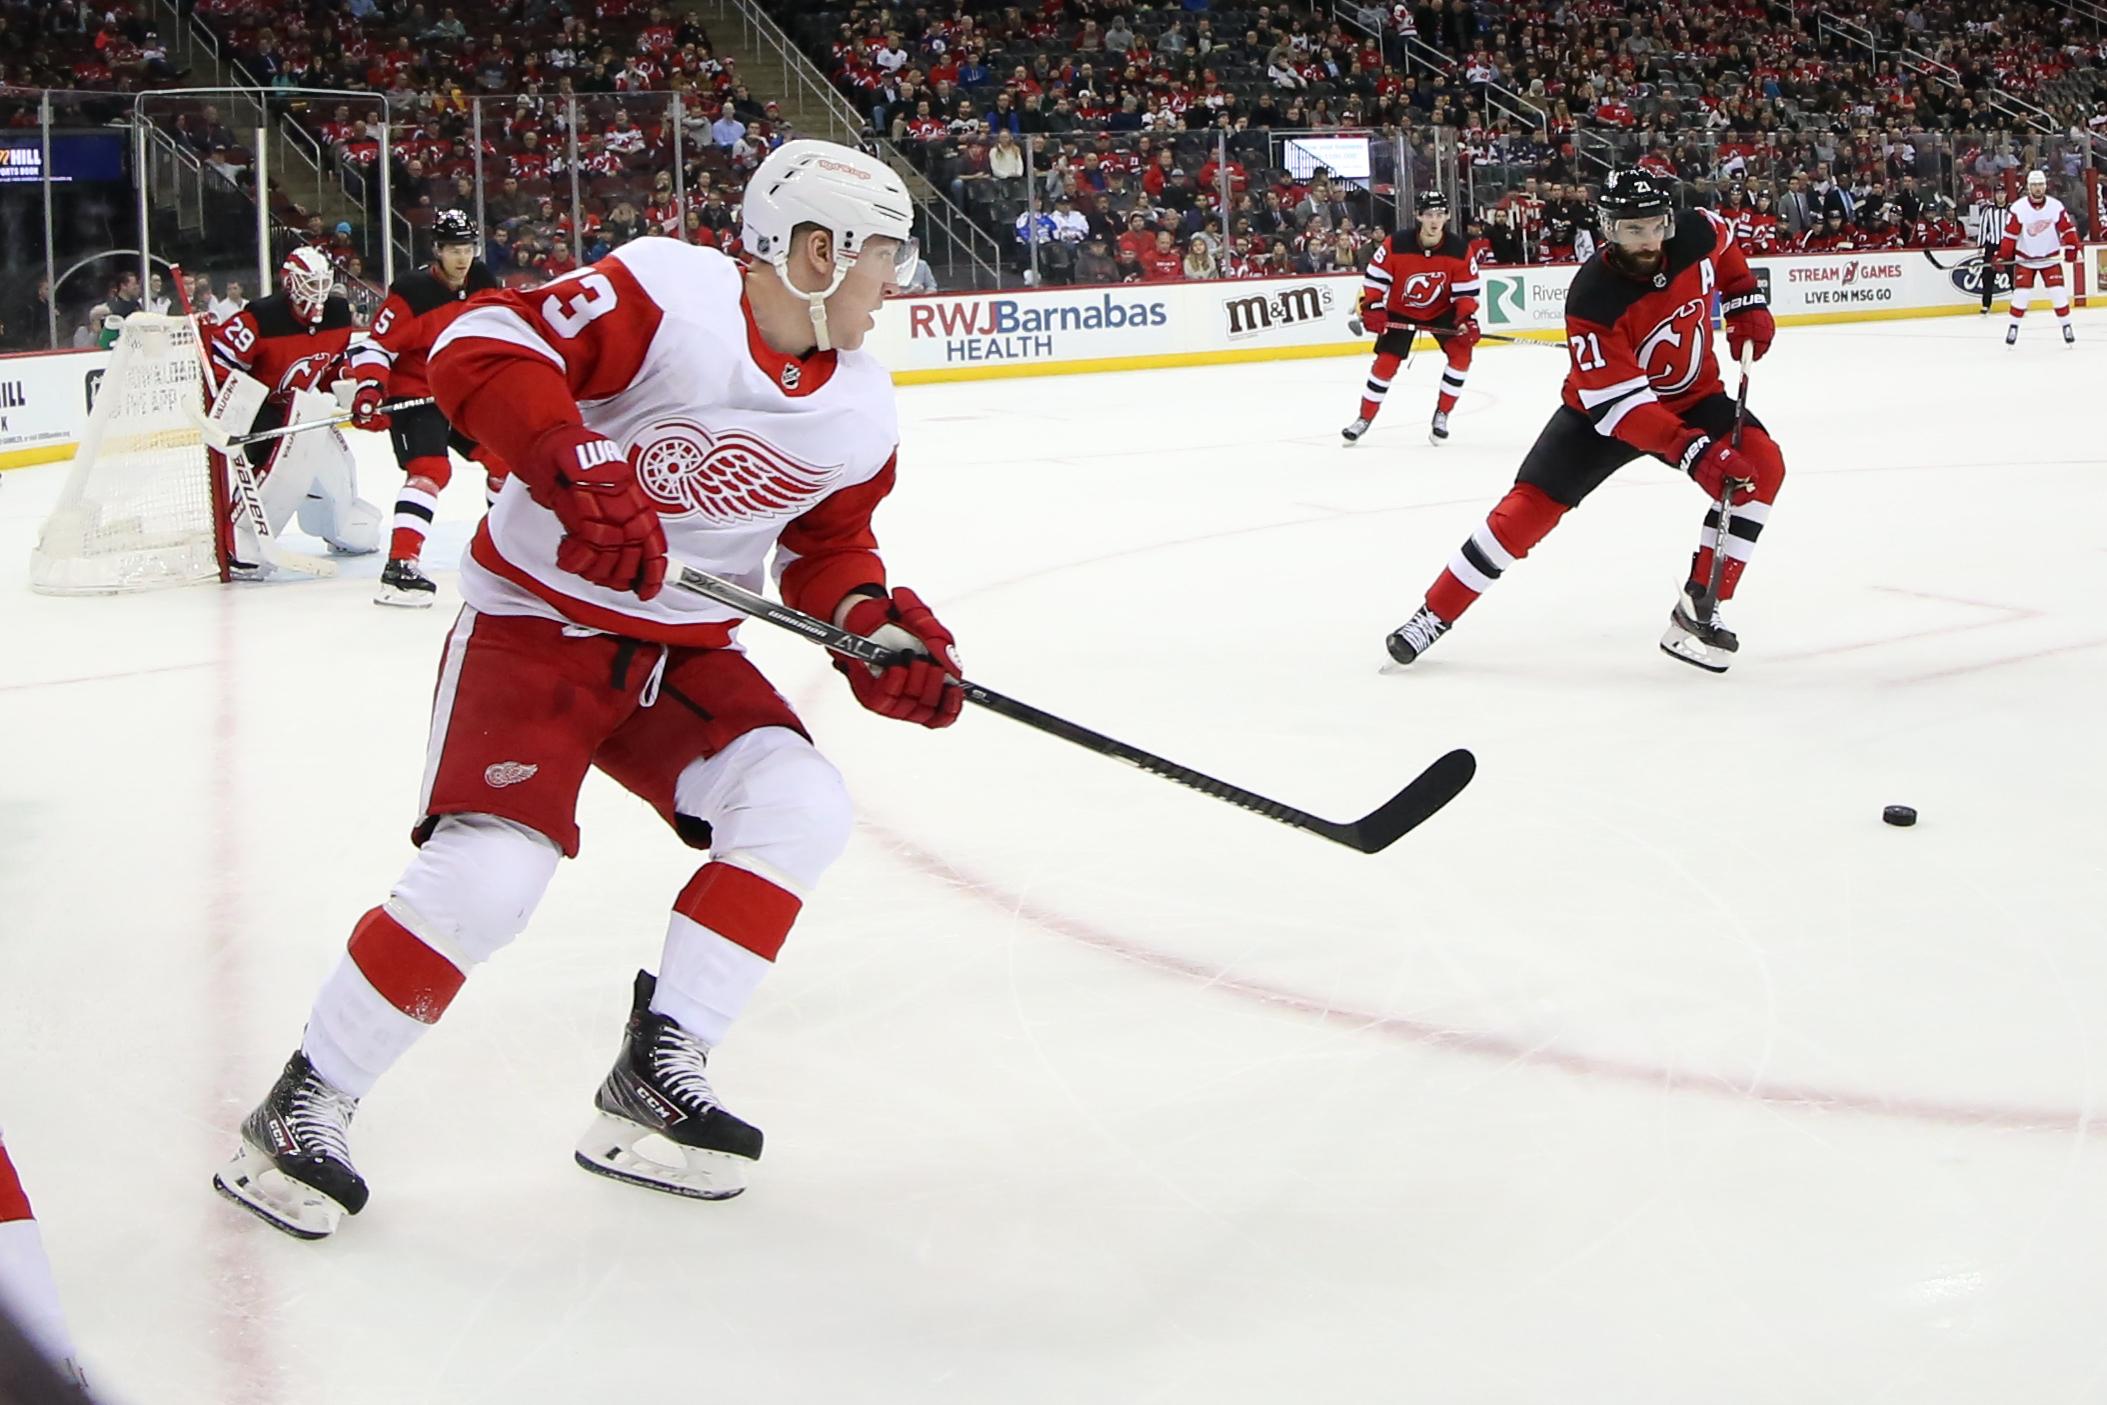 NHL: FEB 13 Red Wings at Devils